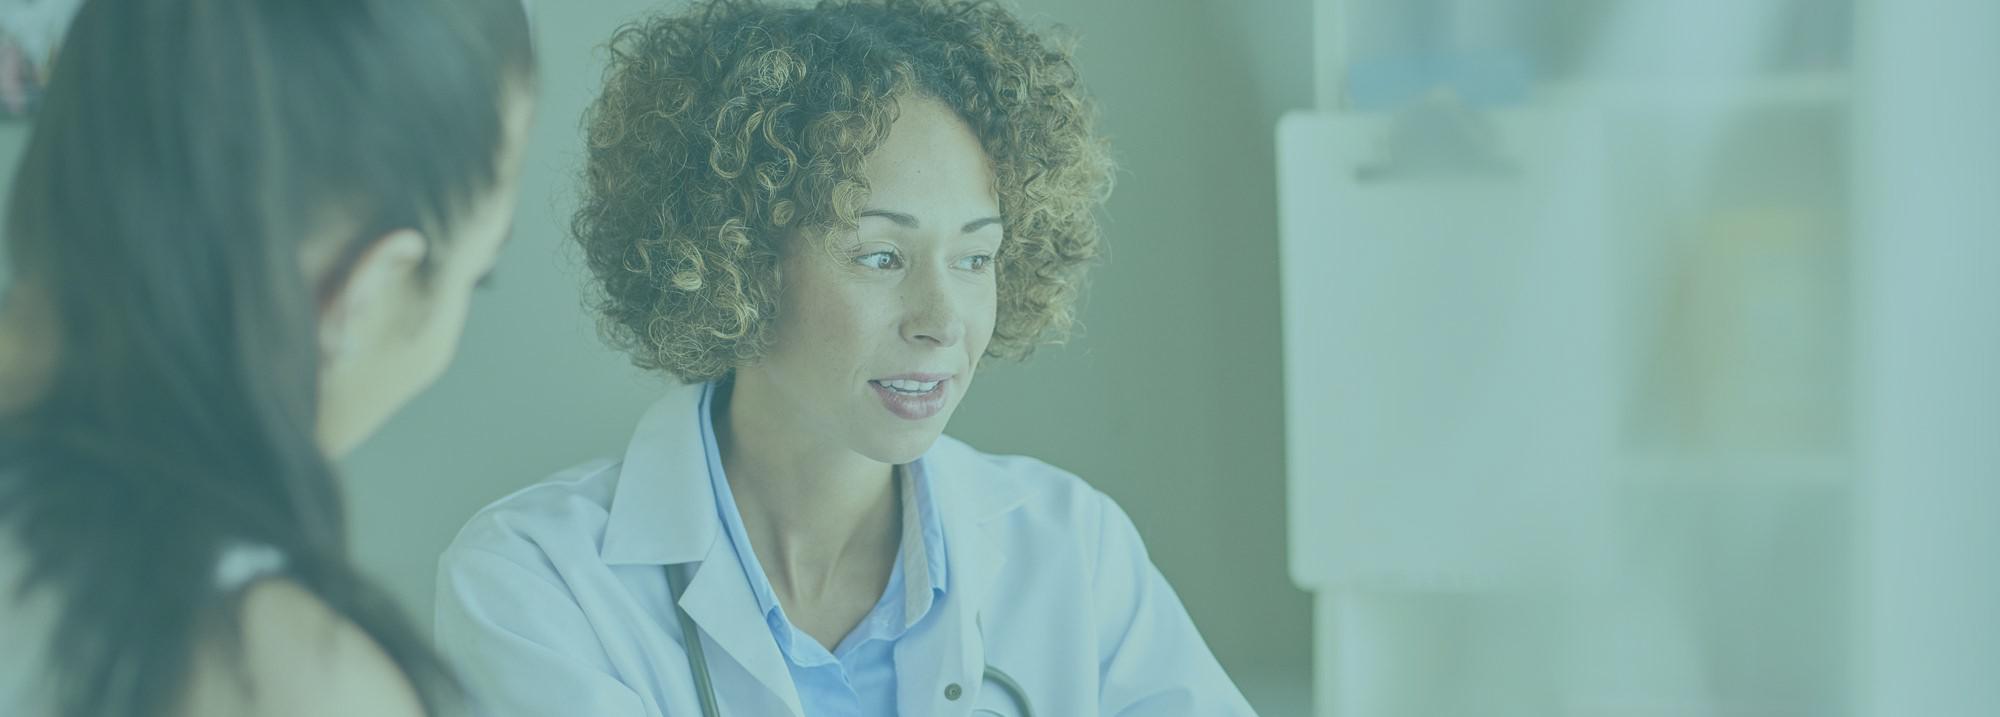 Innovative Solutions for Transgender Health -